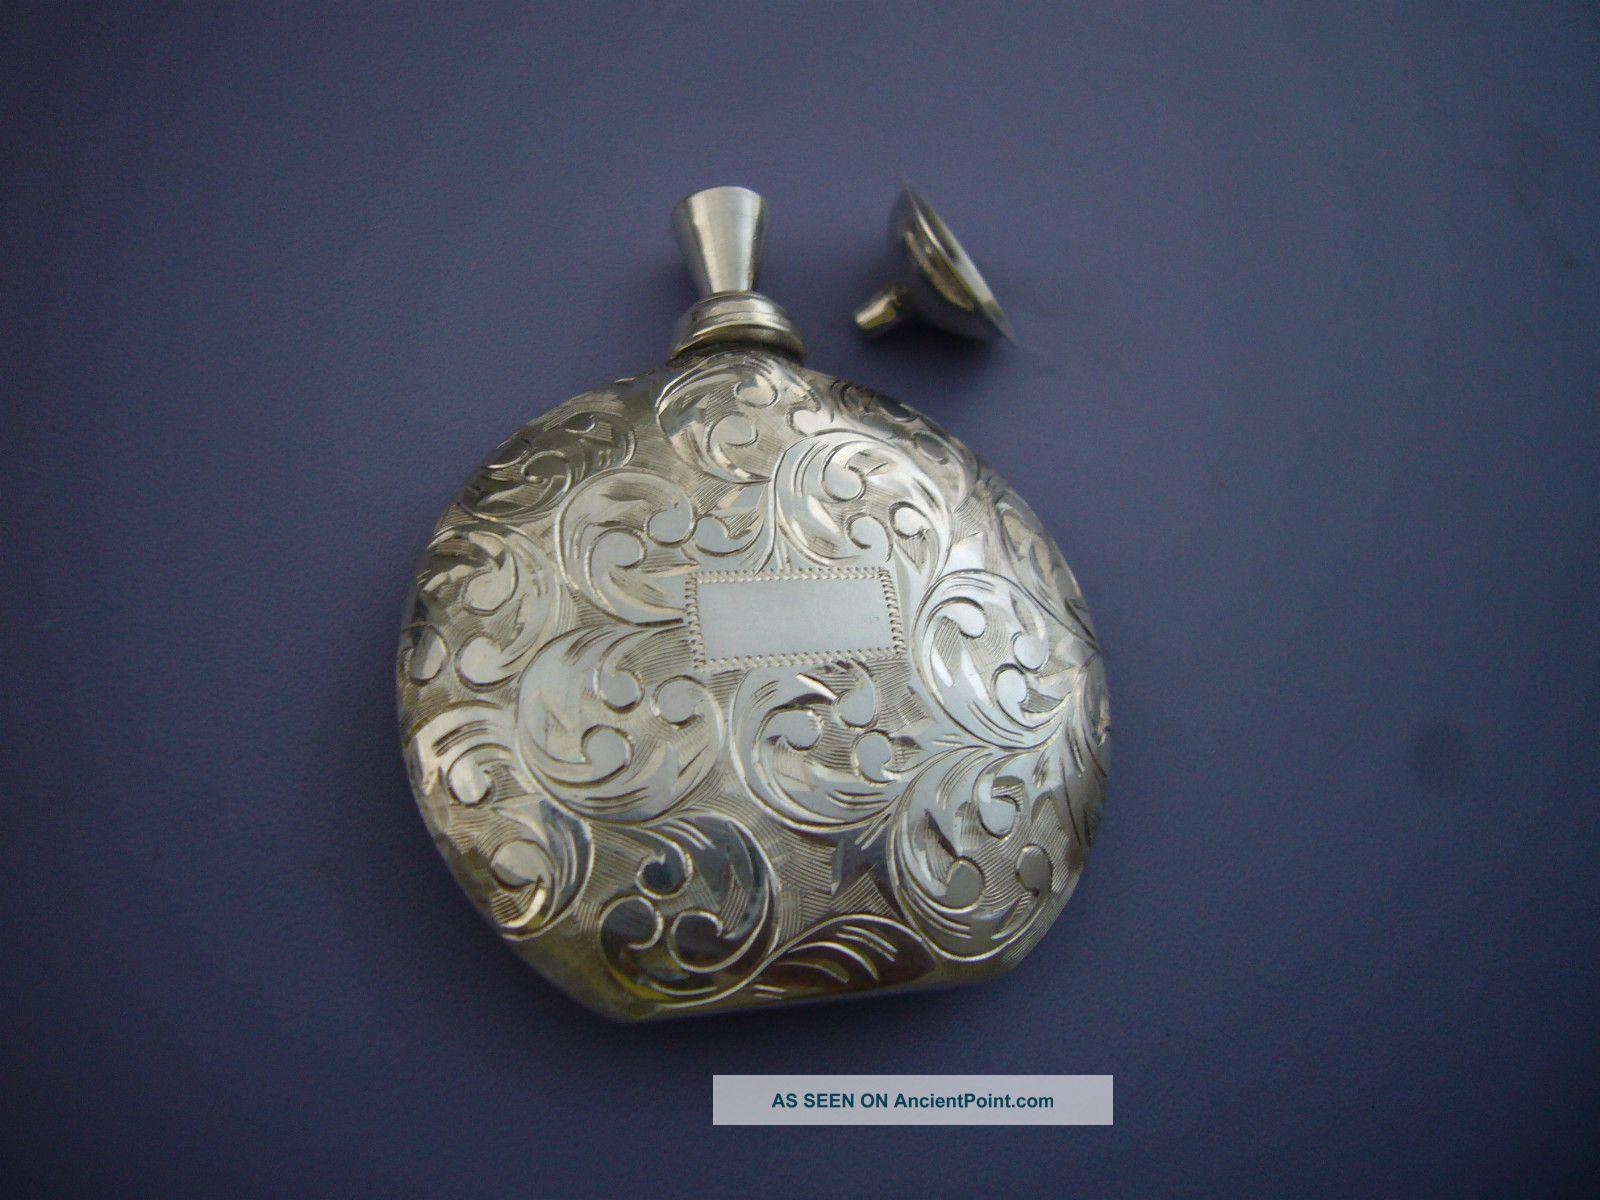 Finest Nand Engraved Japanese Sterling Silver Perfume Bottle Flask+dabber+funnel Bottles, Decanters & Flasks photo